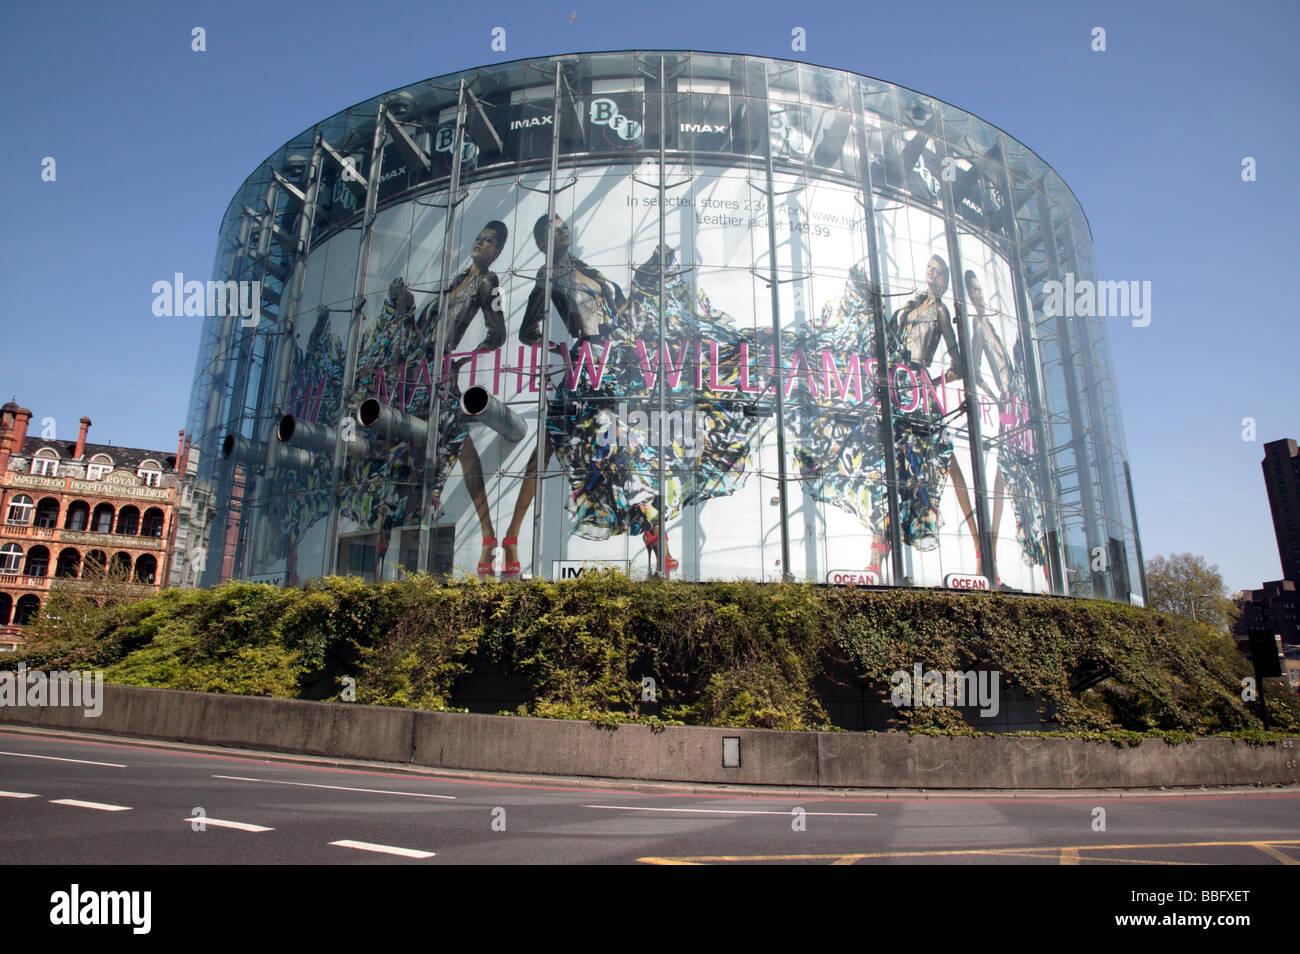 The British Film Institure Imax Cinema in Waterloo Bridge Road - Stock Image